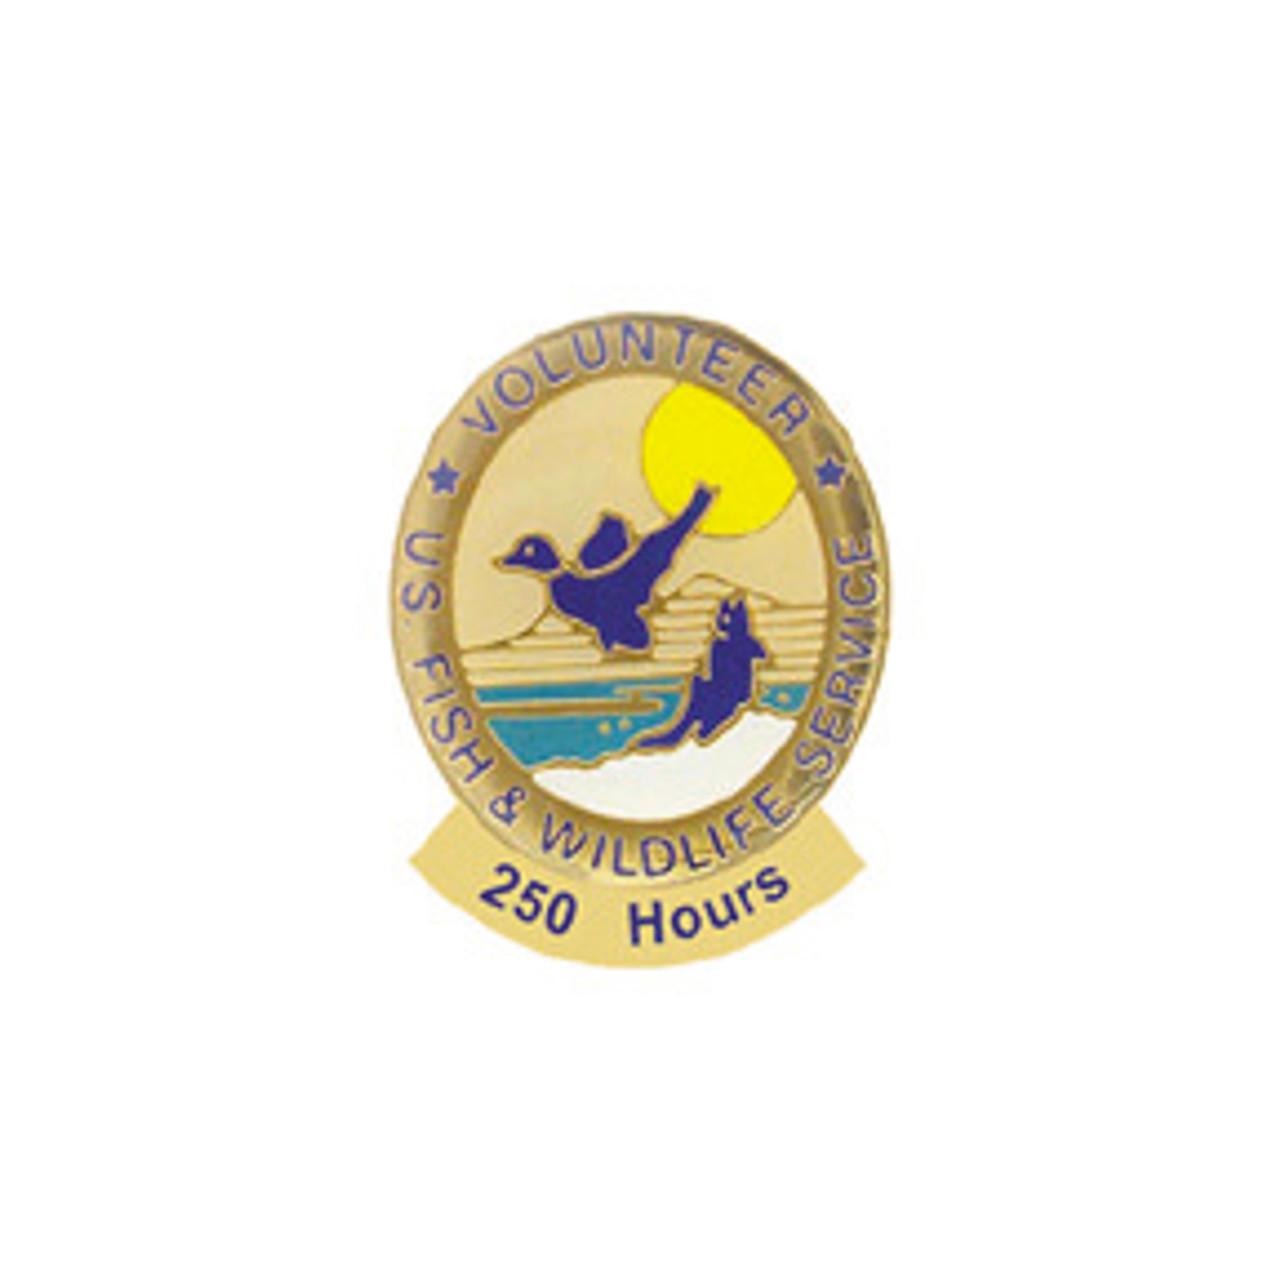 Fish & Wildlife Volunteer Hours Pin (8000 hours)